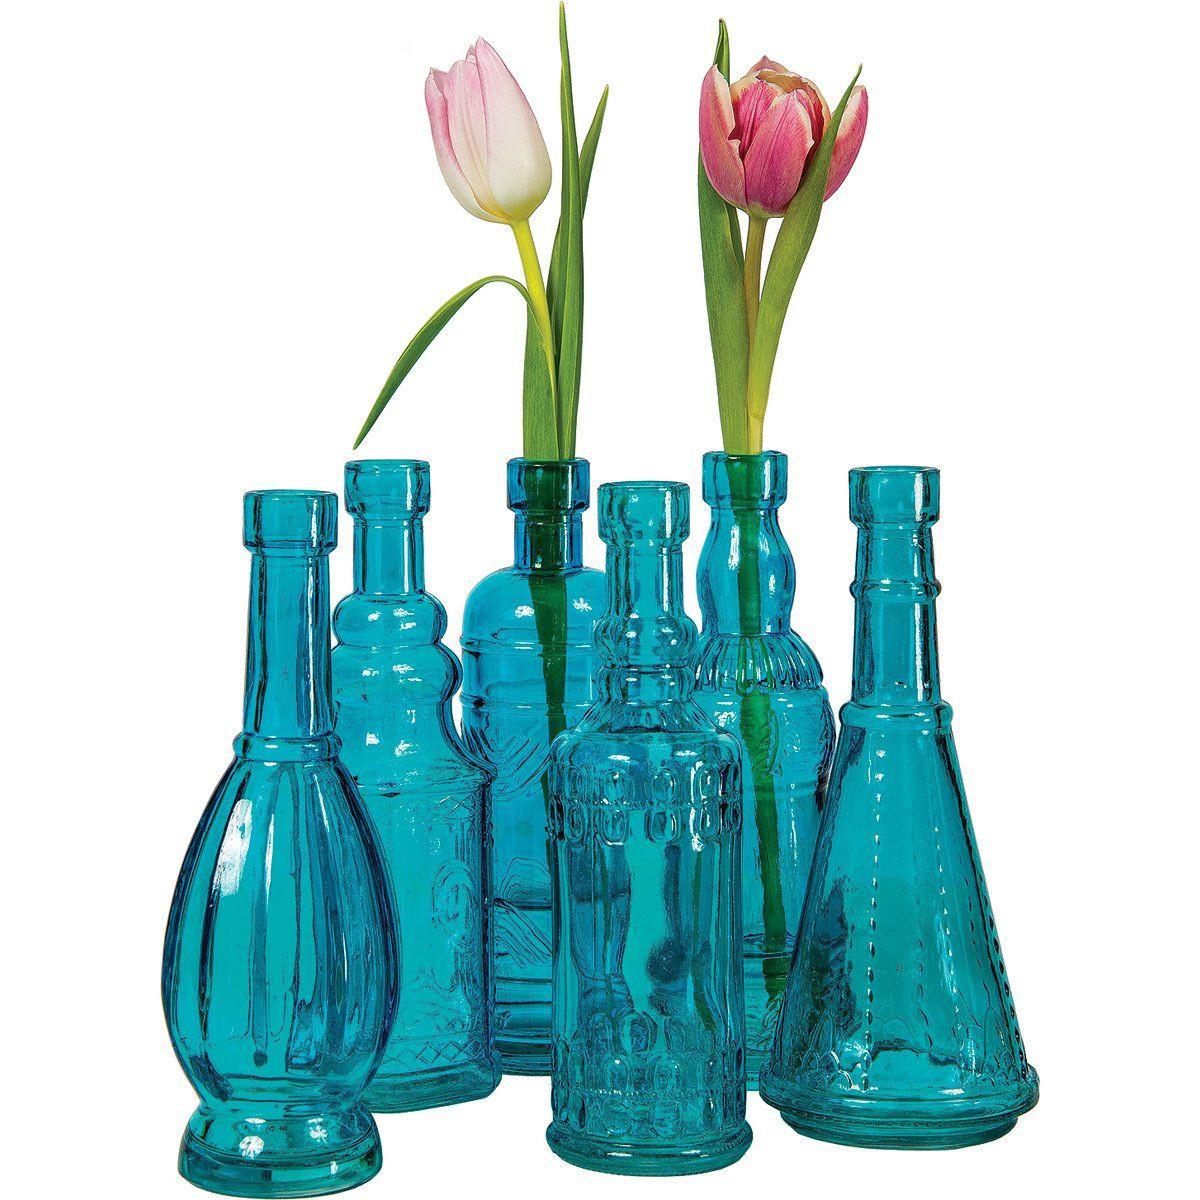 blue cut crystal vase of small crystal vase photograph luna bazaar small vintage glass bottle for small crystal vase photograph luna bazaar small vintage glass bottle set 7 inch turquoise blue of